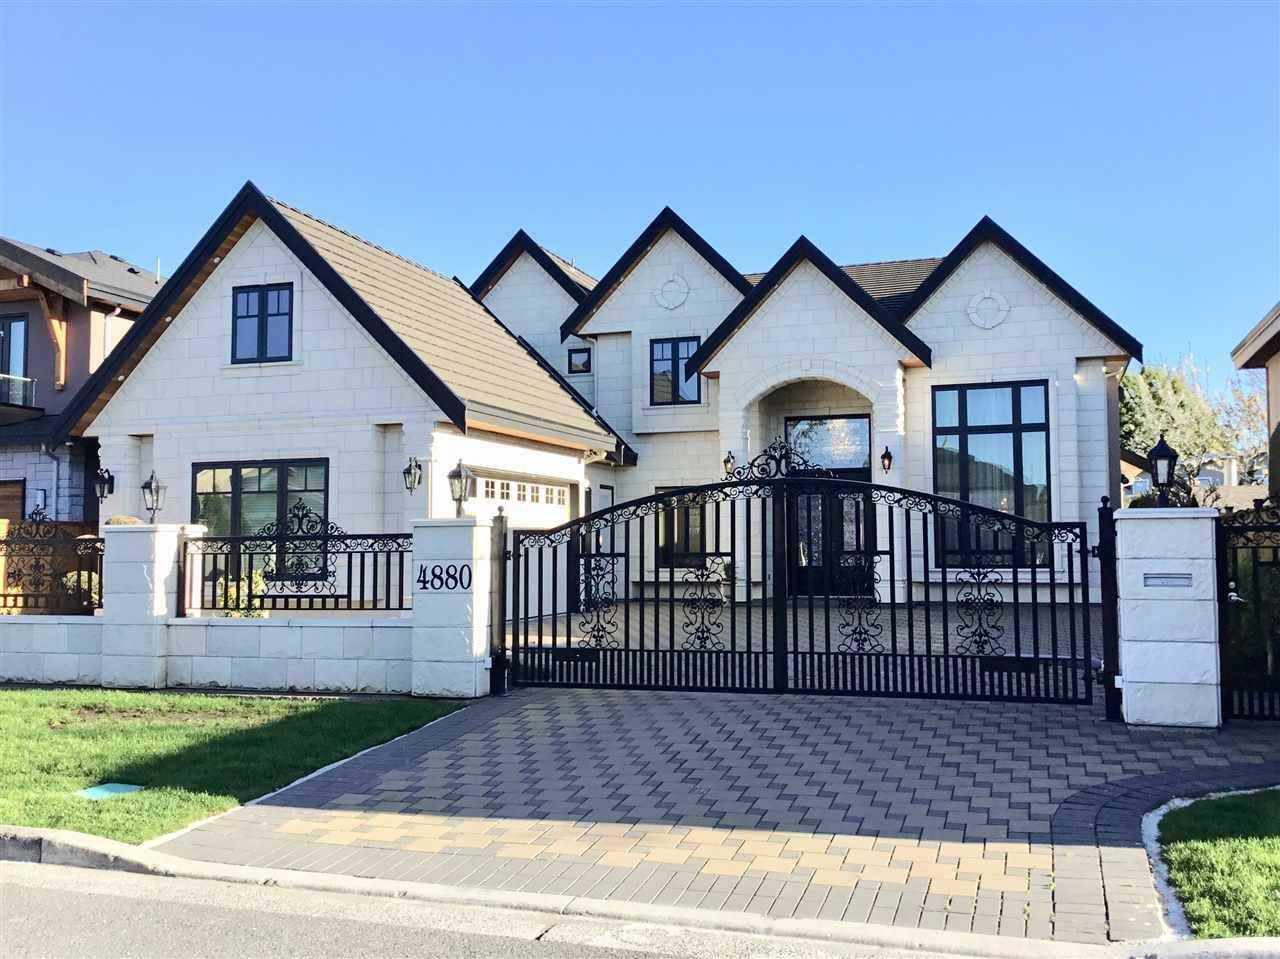 Main Photo: 4880 WINTERGREEN Avenue in Richmond: Riverdale RI House for sale : MLS®# R2422881